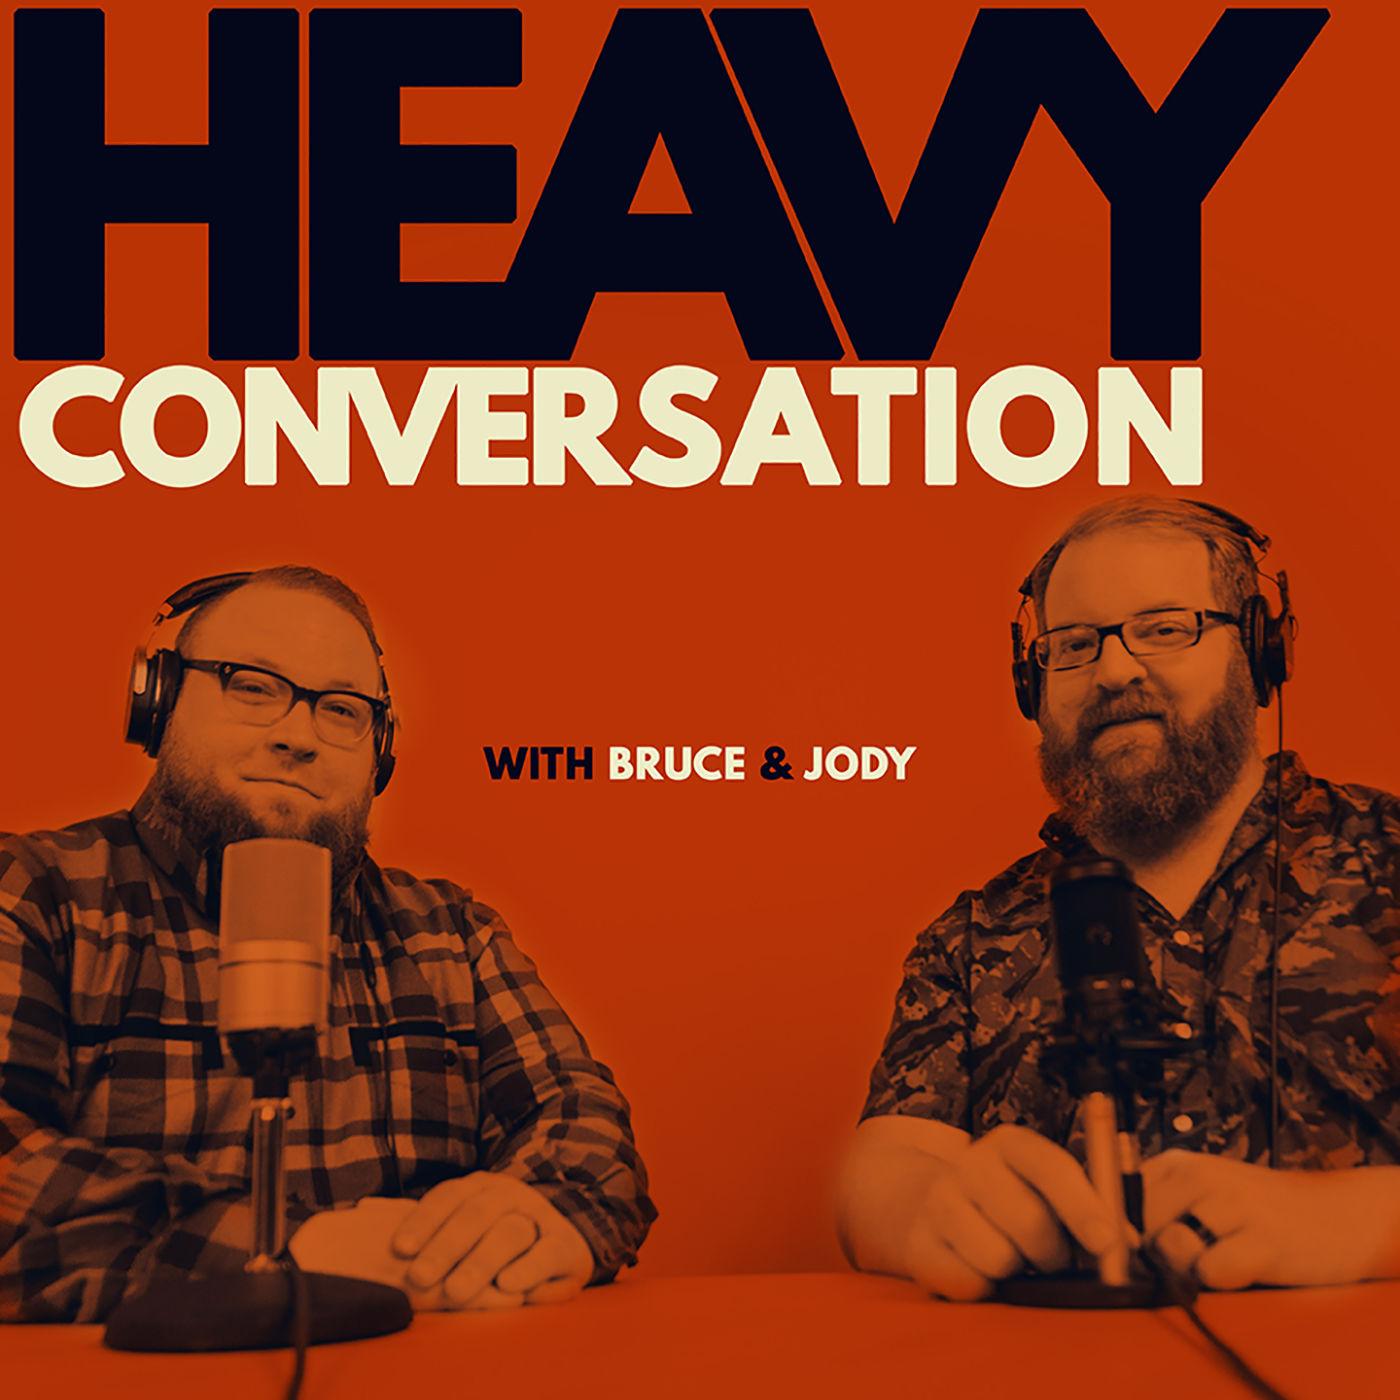 Epidose 153: 3 Years of Heavy Conversation